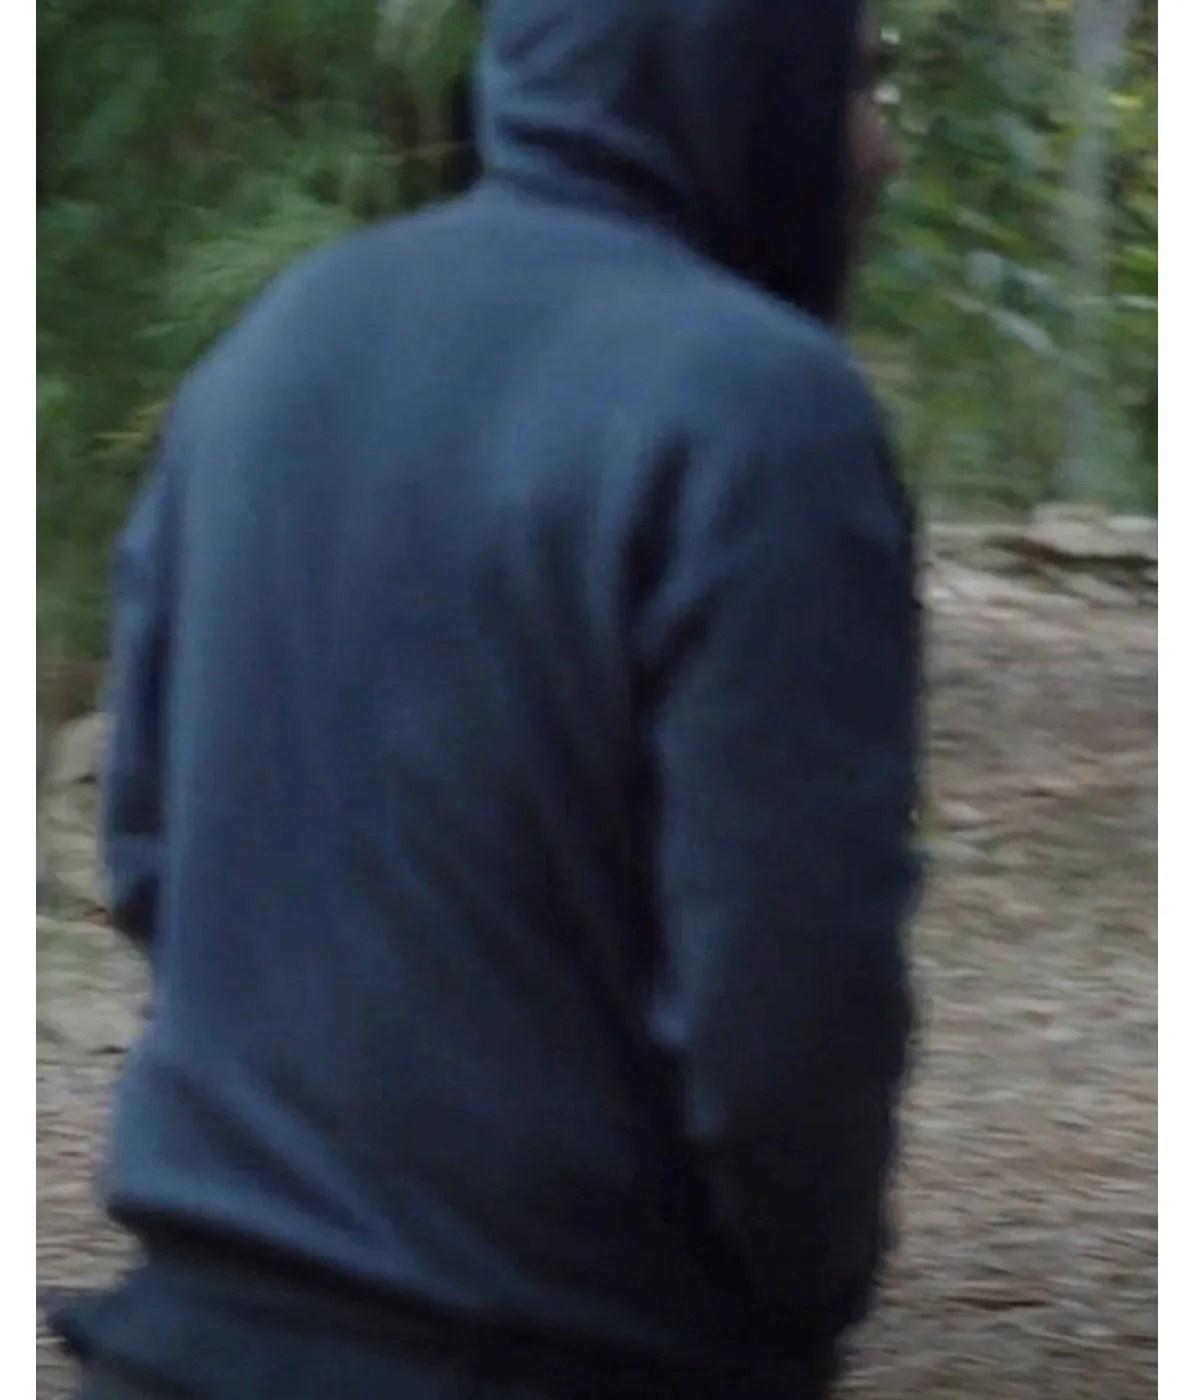 nine-perfect-strangers-bobby-cannavale-tony-hogburn-hoodie